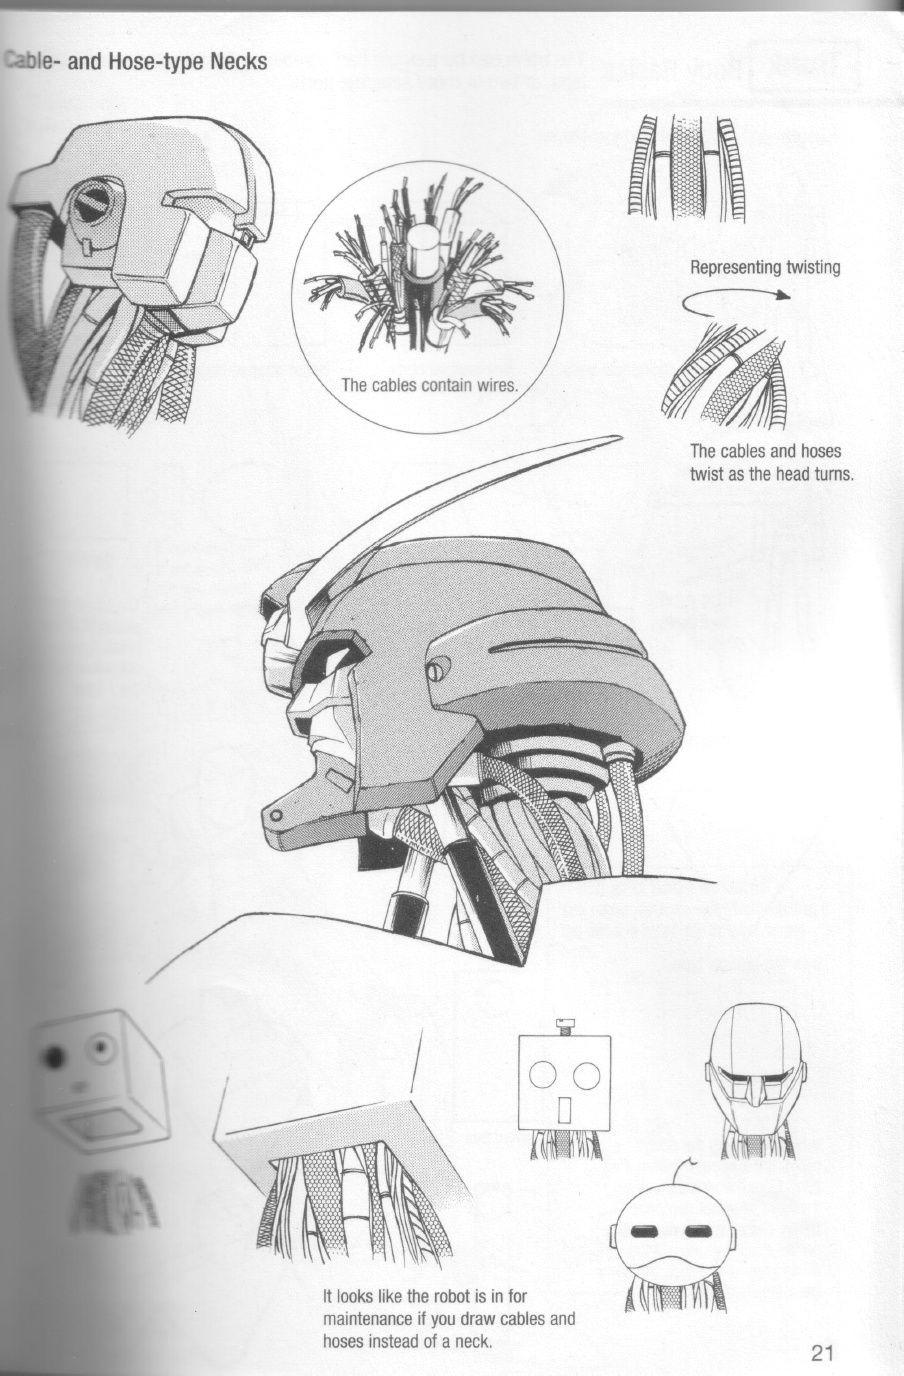 como desenhar manga roba s manga drawing drawing tips drawing reference robots drawing